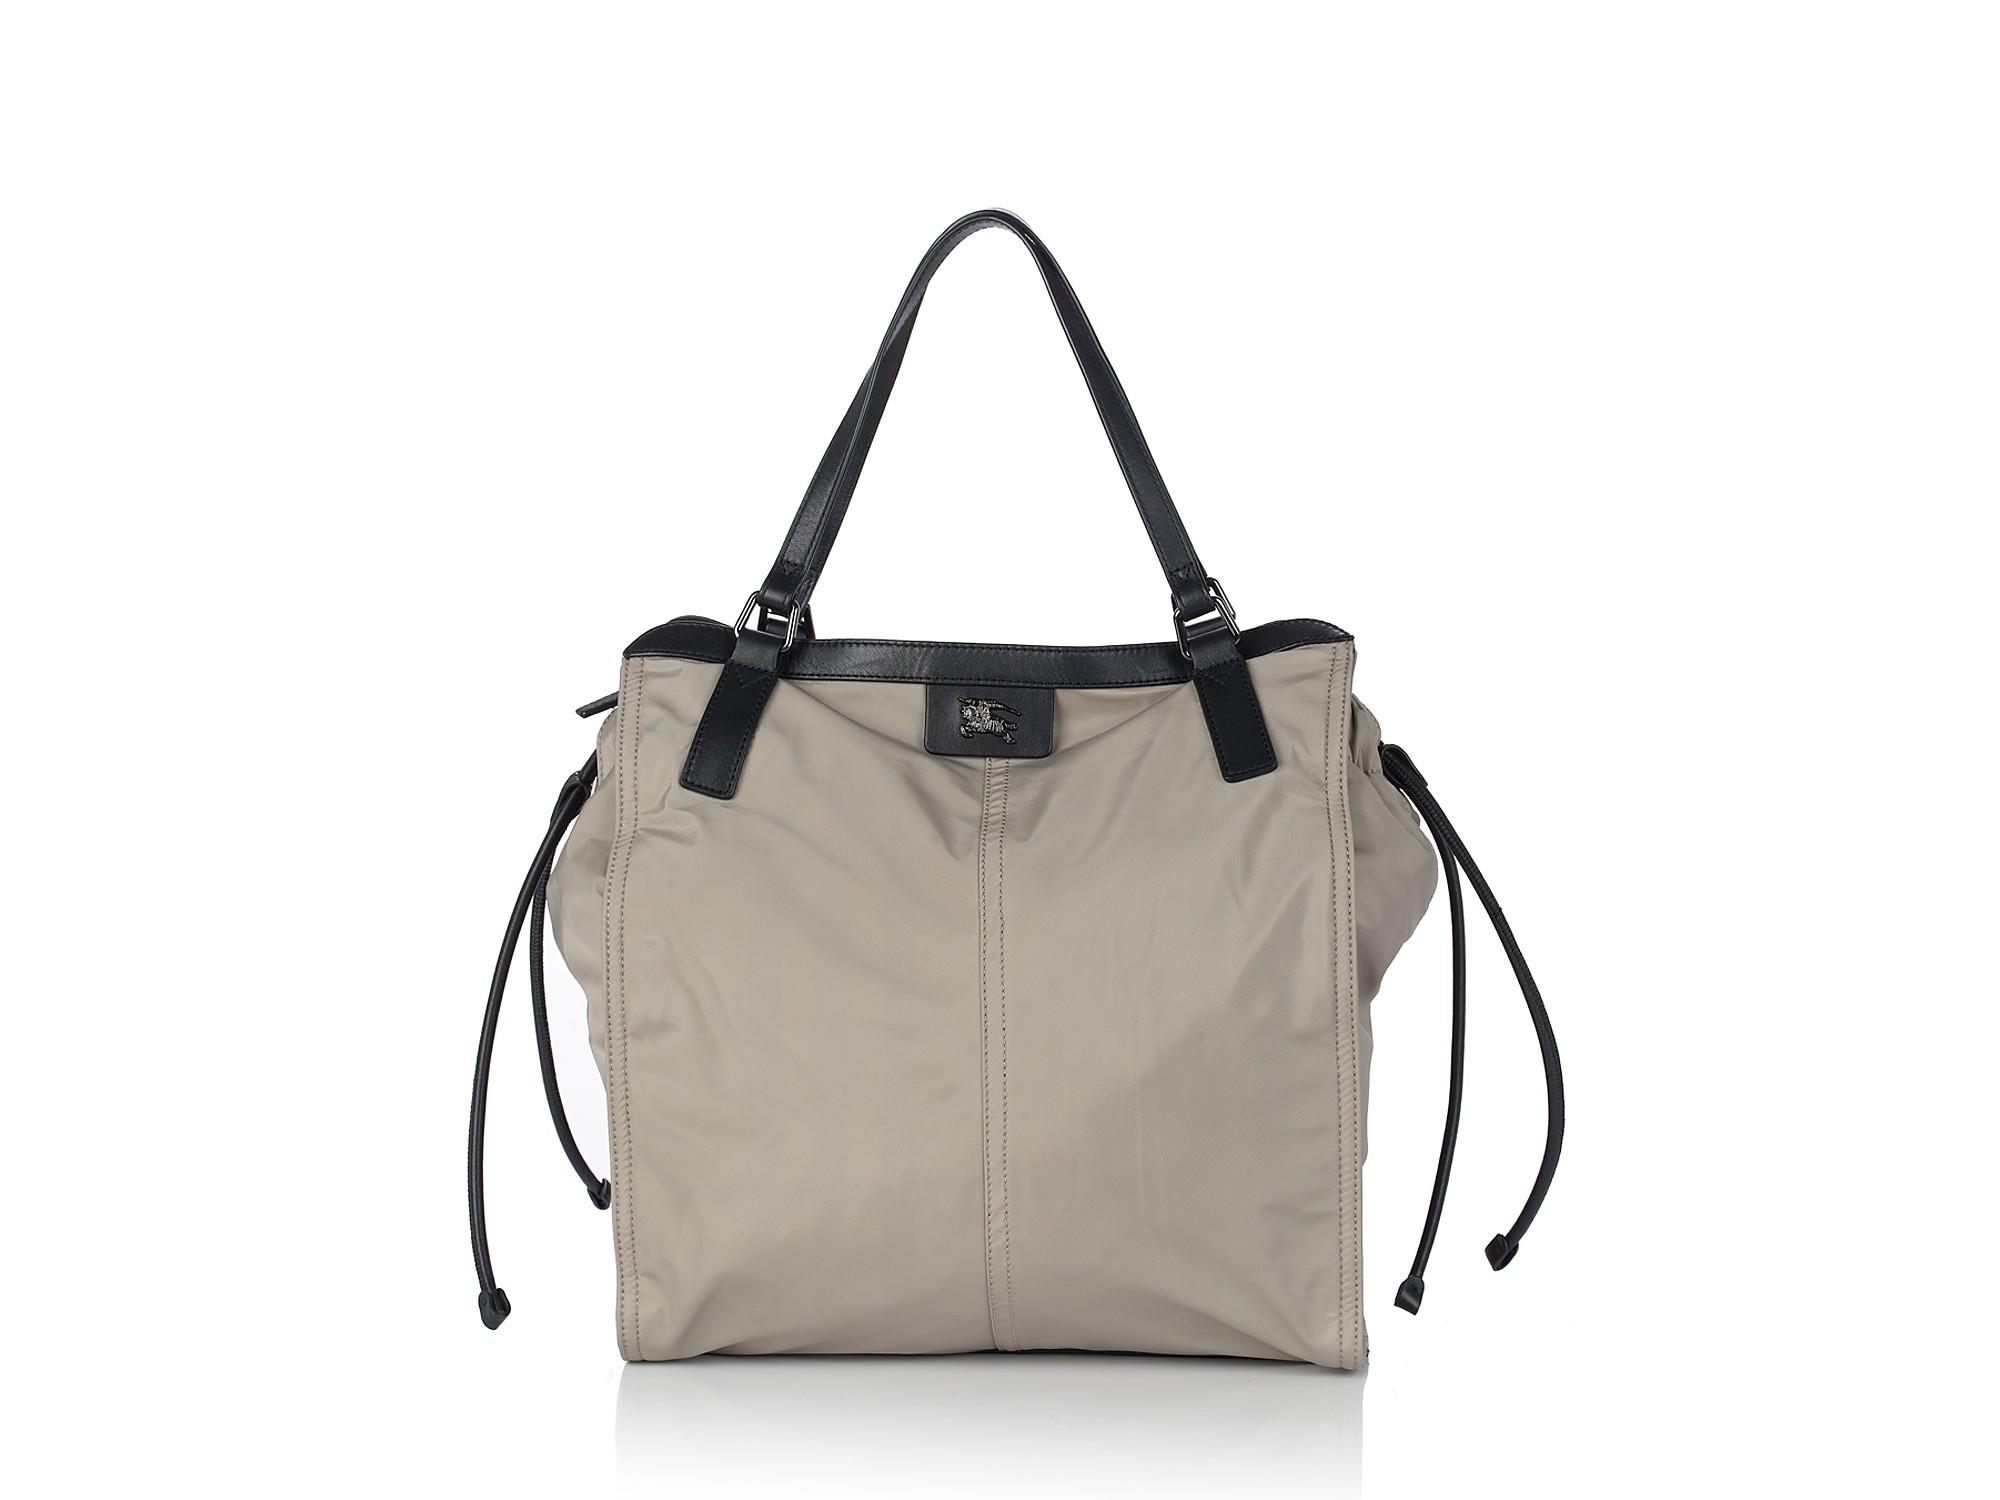 095fe86b0718 Burberry Handbags At Saks